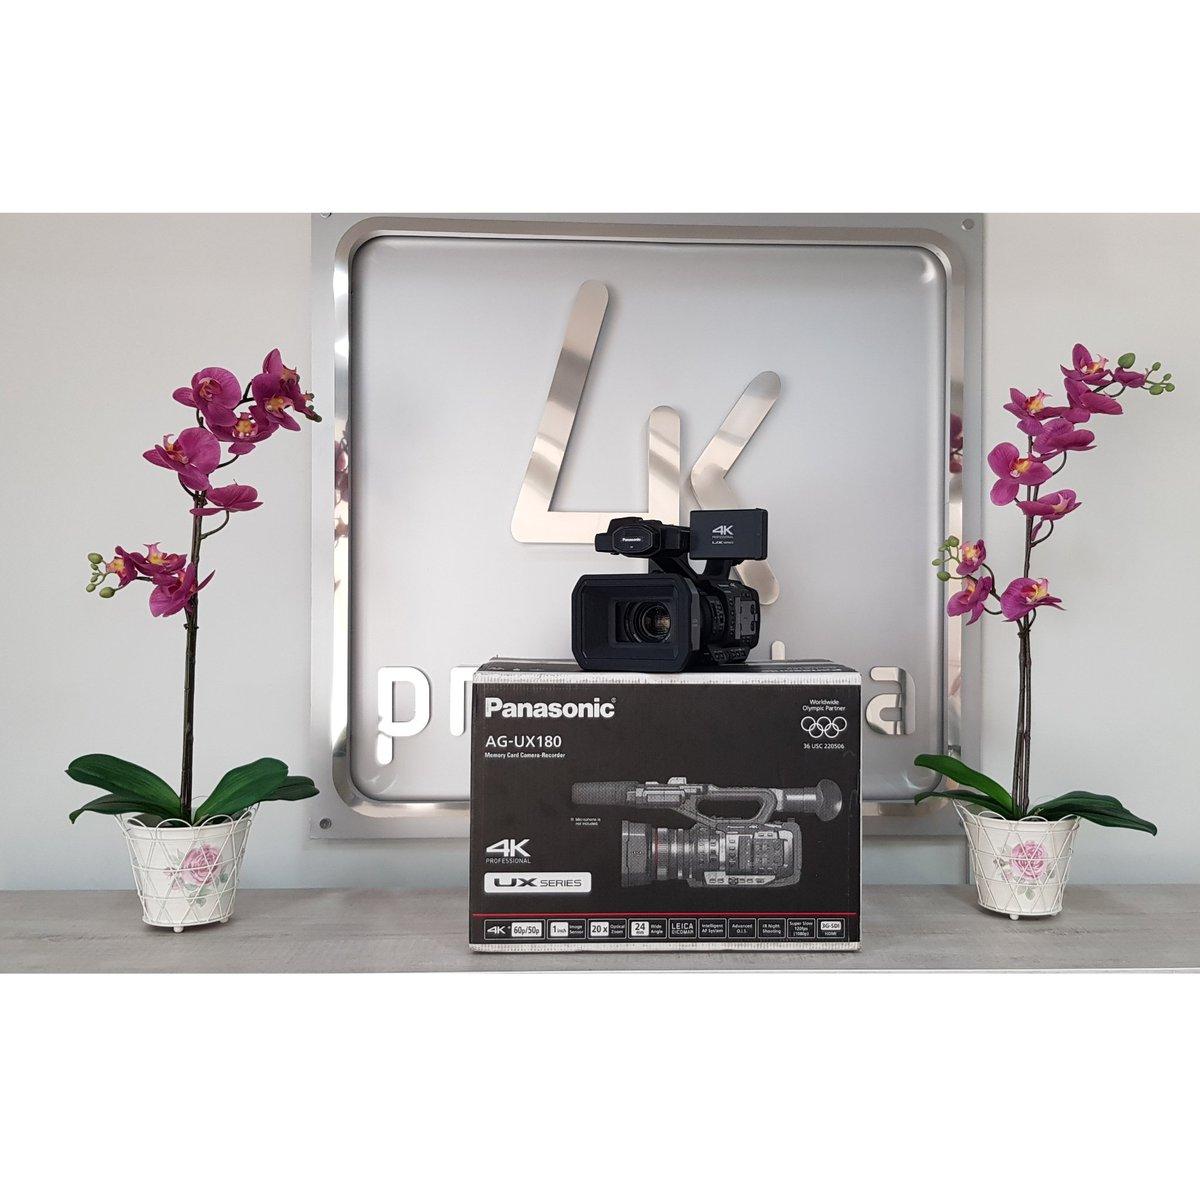 💫#Panasonic AG #UX180 🎥  💥Detaylı bilgi ve stok için👇 ☎️0️⃣2️⃣1️⃣2️⃣2️⃣2️⃣2️⃣0️⃣0️⃣3️⃣0️⃣ 📧info@4kpromedya.com.tr #panasonic #camera #4k #professional #uxseries #ux #memory #card #recorder #television #media #broadcast #cam #hd #film #slowmotion #filmmaker #produksiyon #aktüel #studio